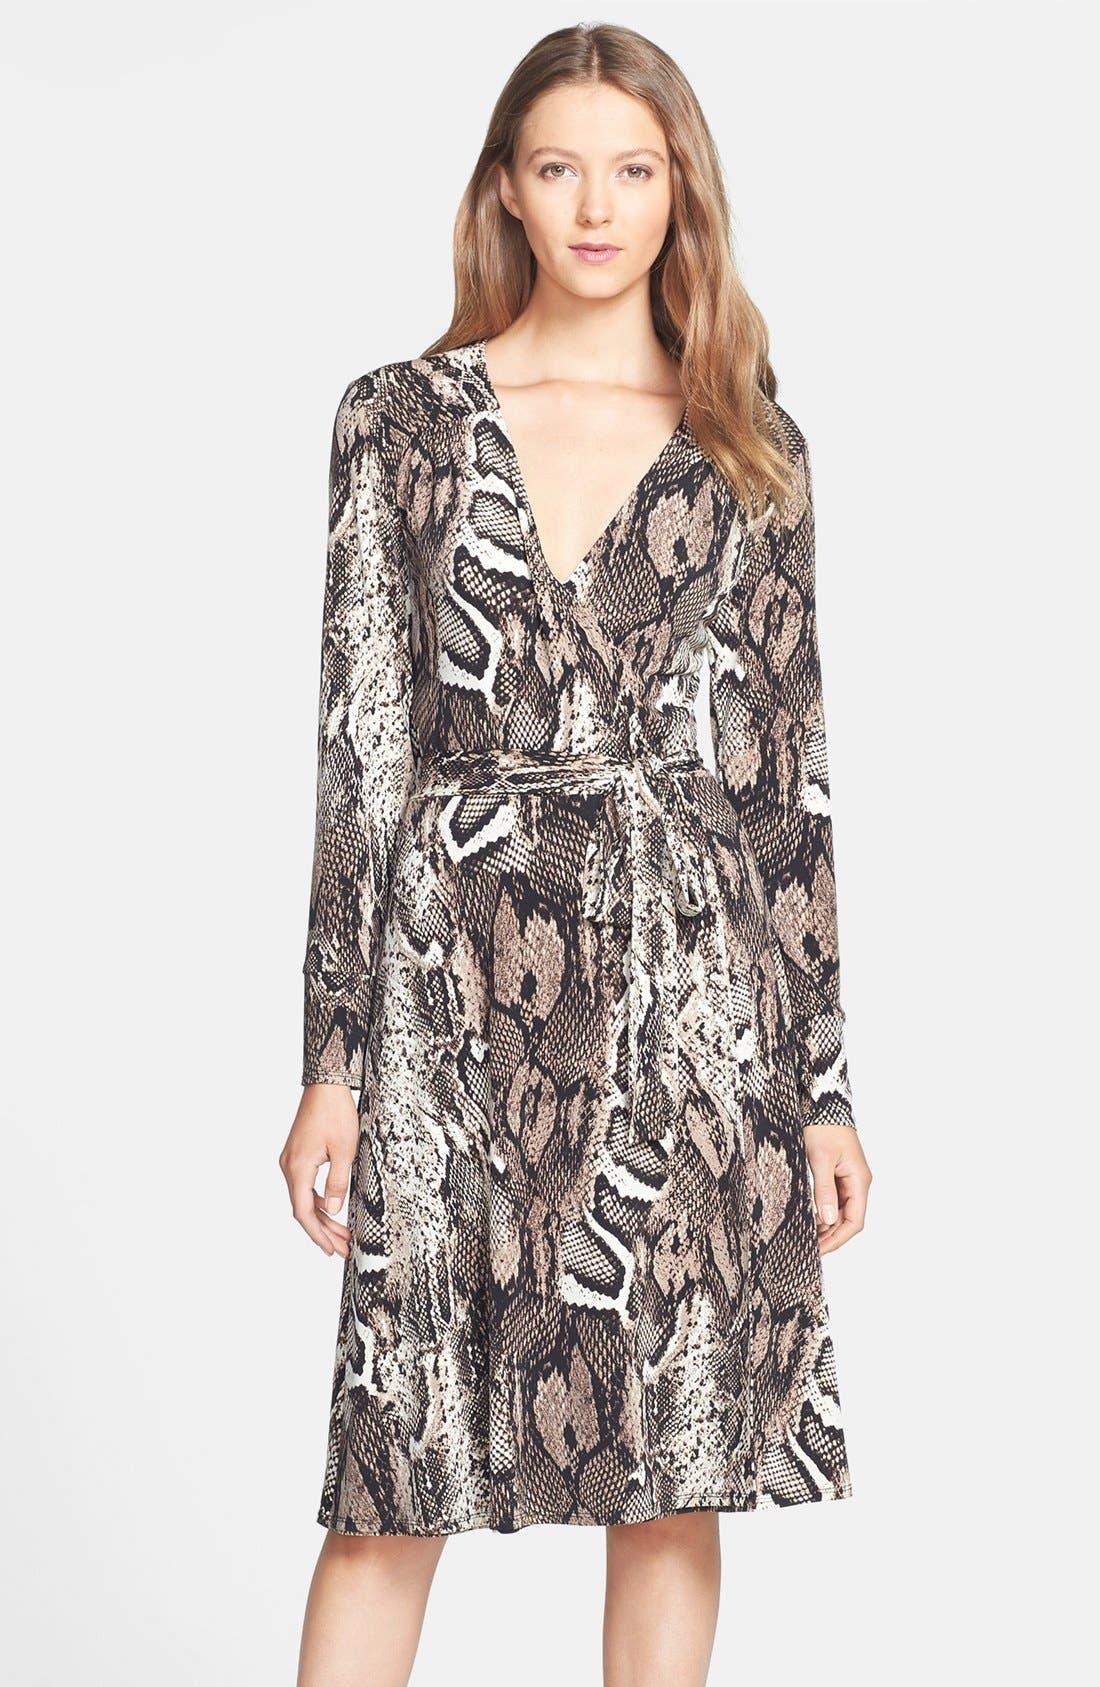 Alternate Image 1 Selected - Donna Morgan Snakeskin Print Faux Wrap Jersey Dress